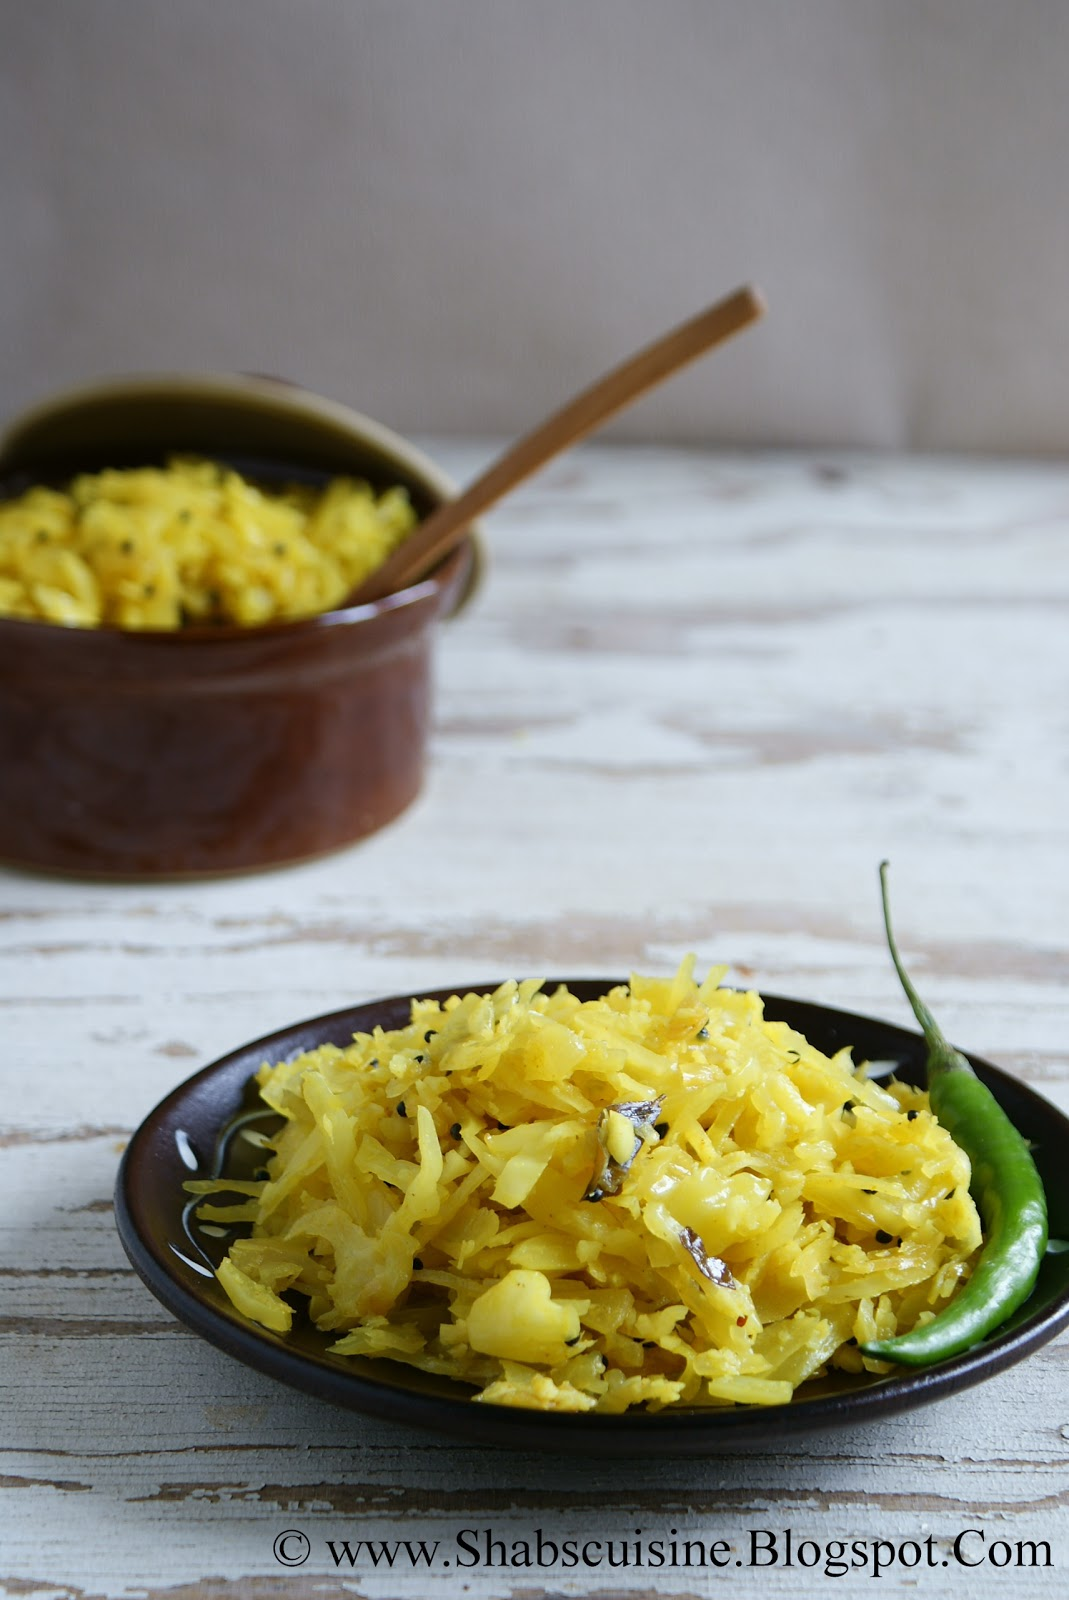 ... : Cabbage Thoran / Cabbage Varavu/ Kerala Style Cabbage Stir-fry